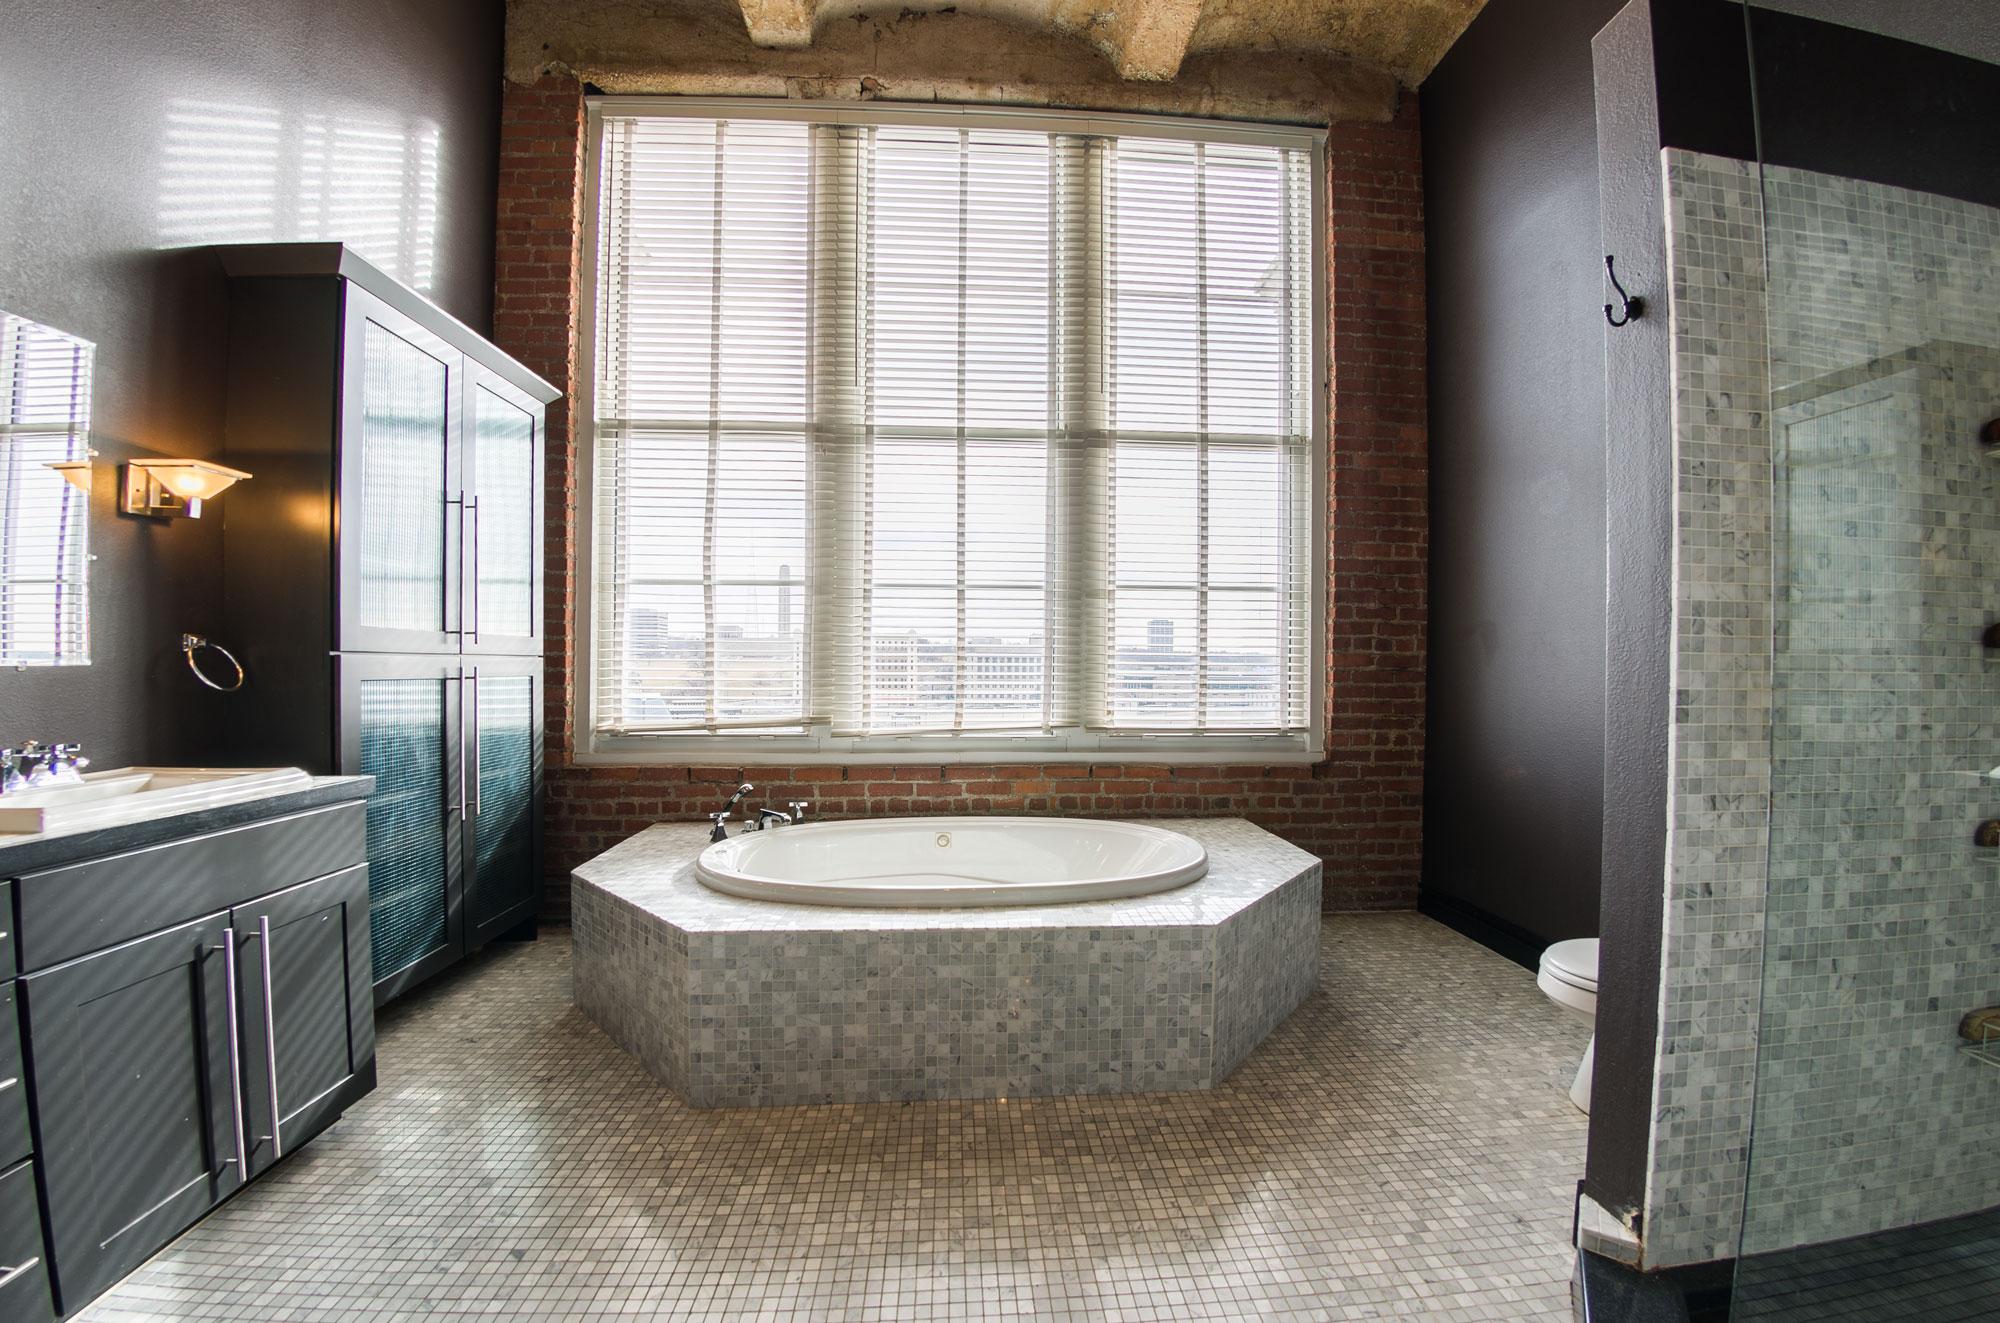 Featured For Rent Stuart Hall 609 Kansas City Lofts Condos